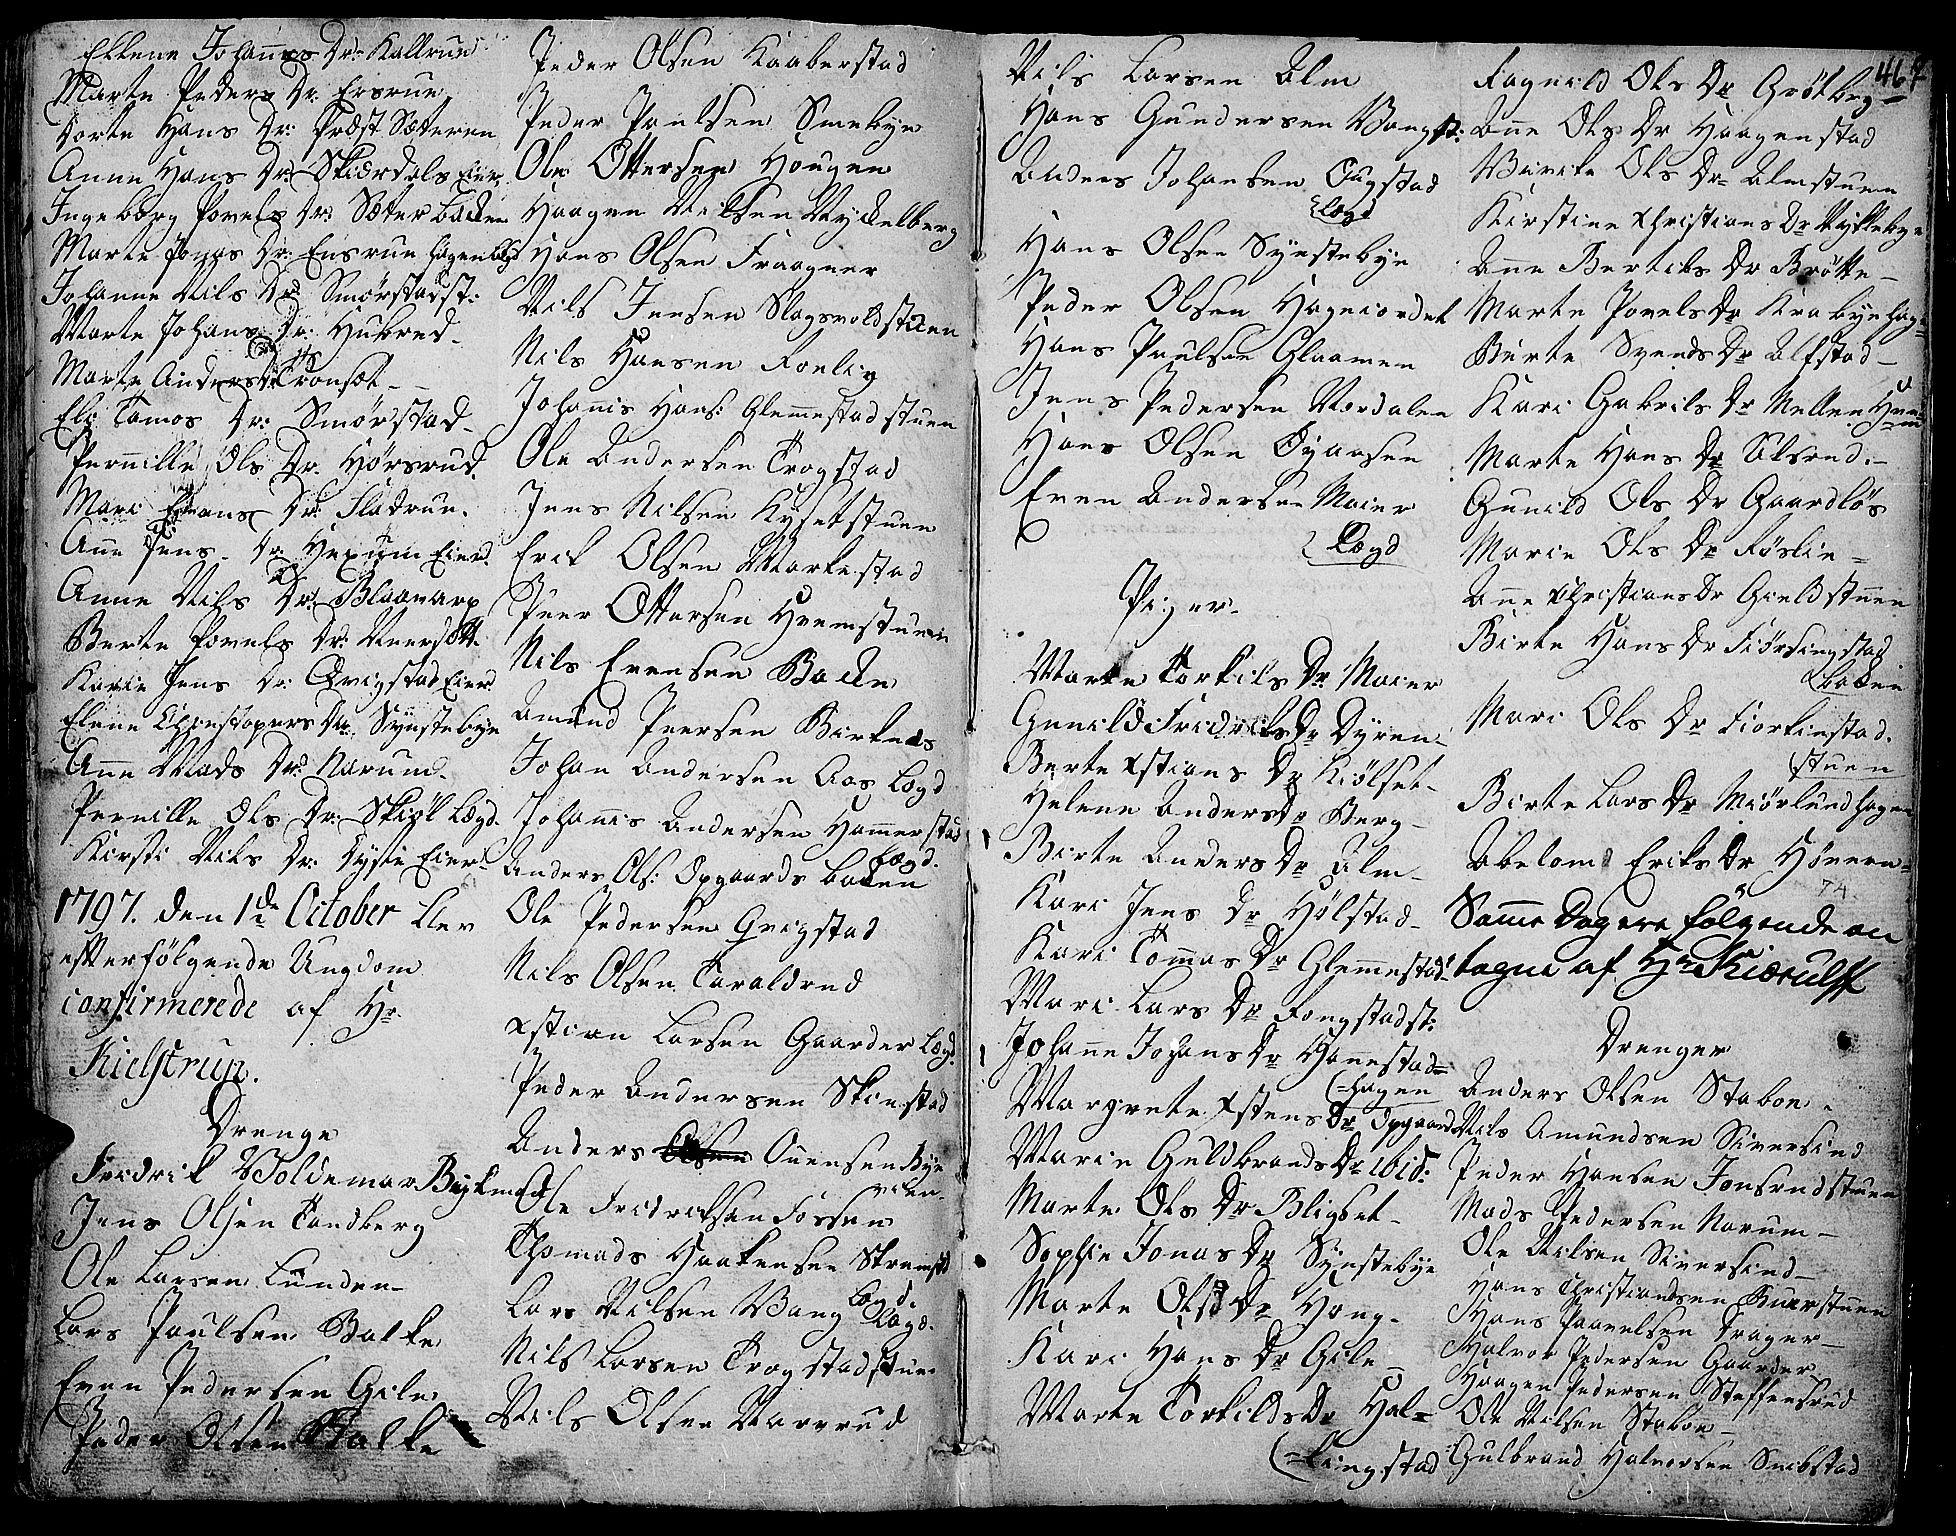 SAH, Toten prestekontor, Ministerialbok nr. 7, 1794-1809, s. 467